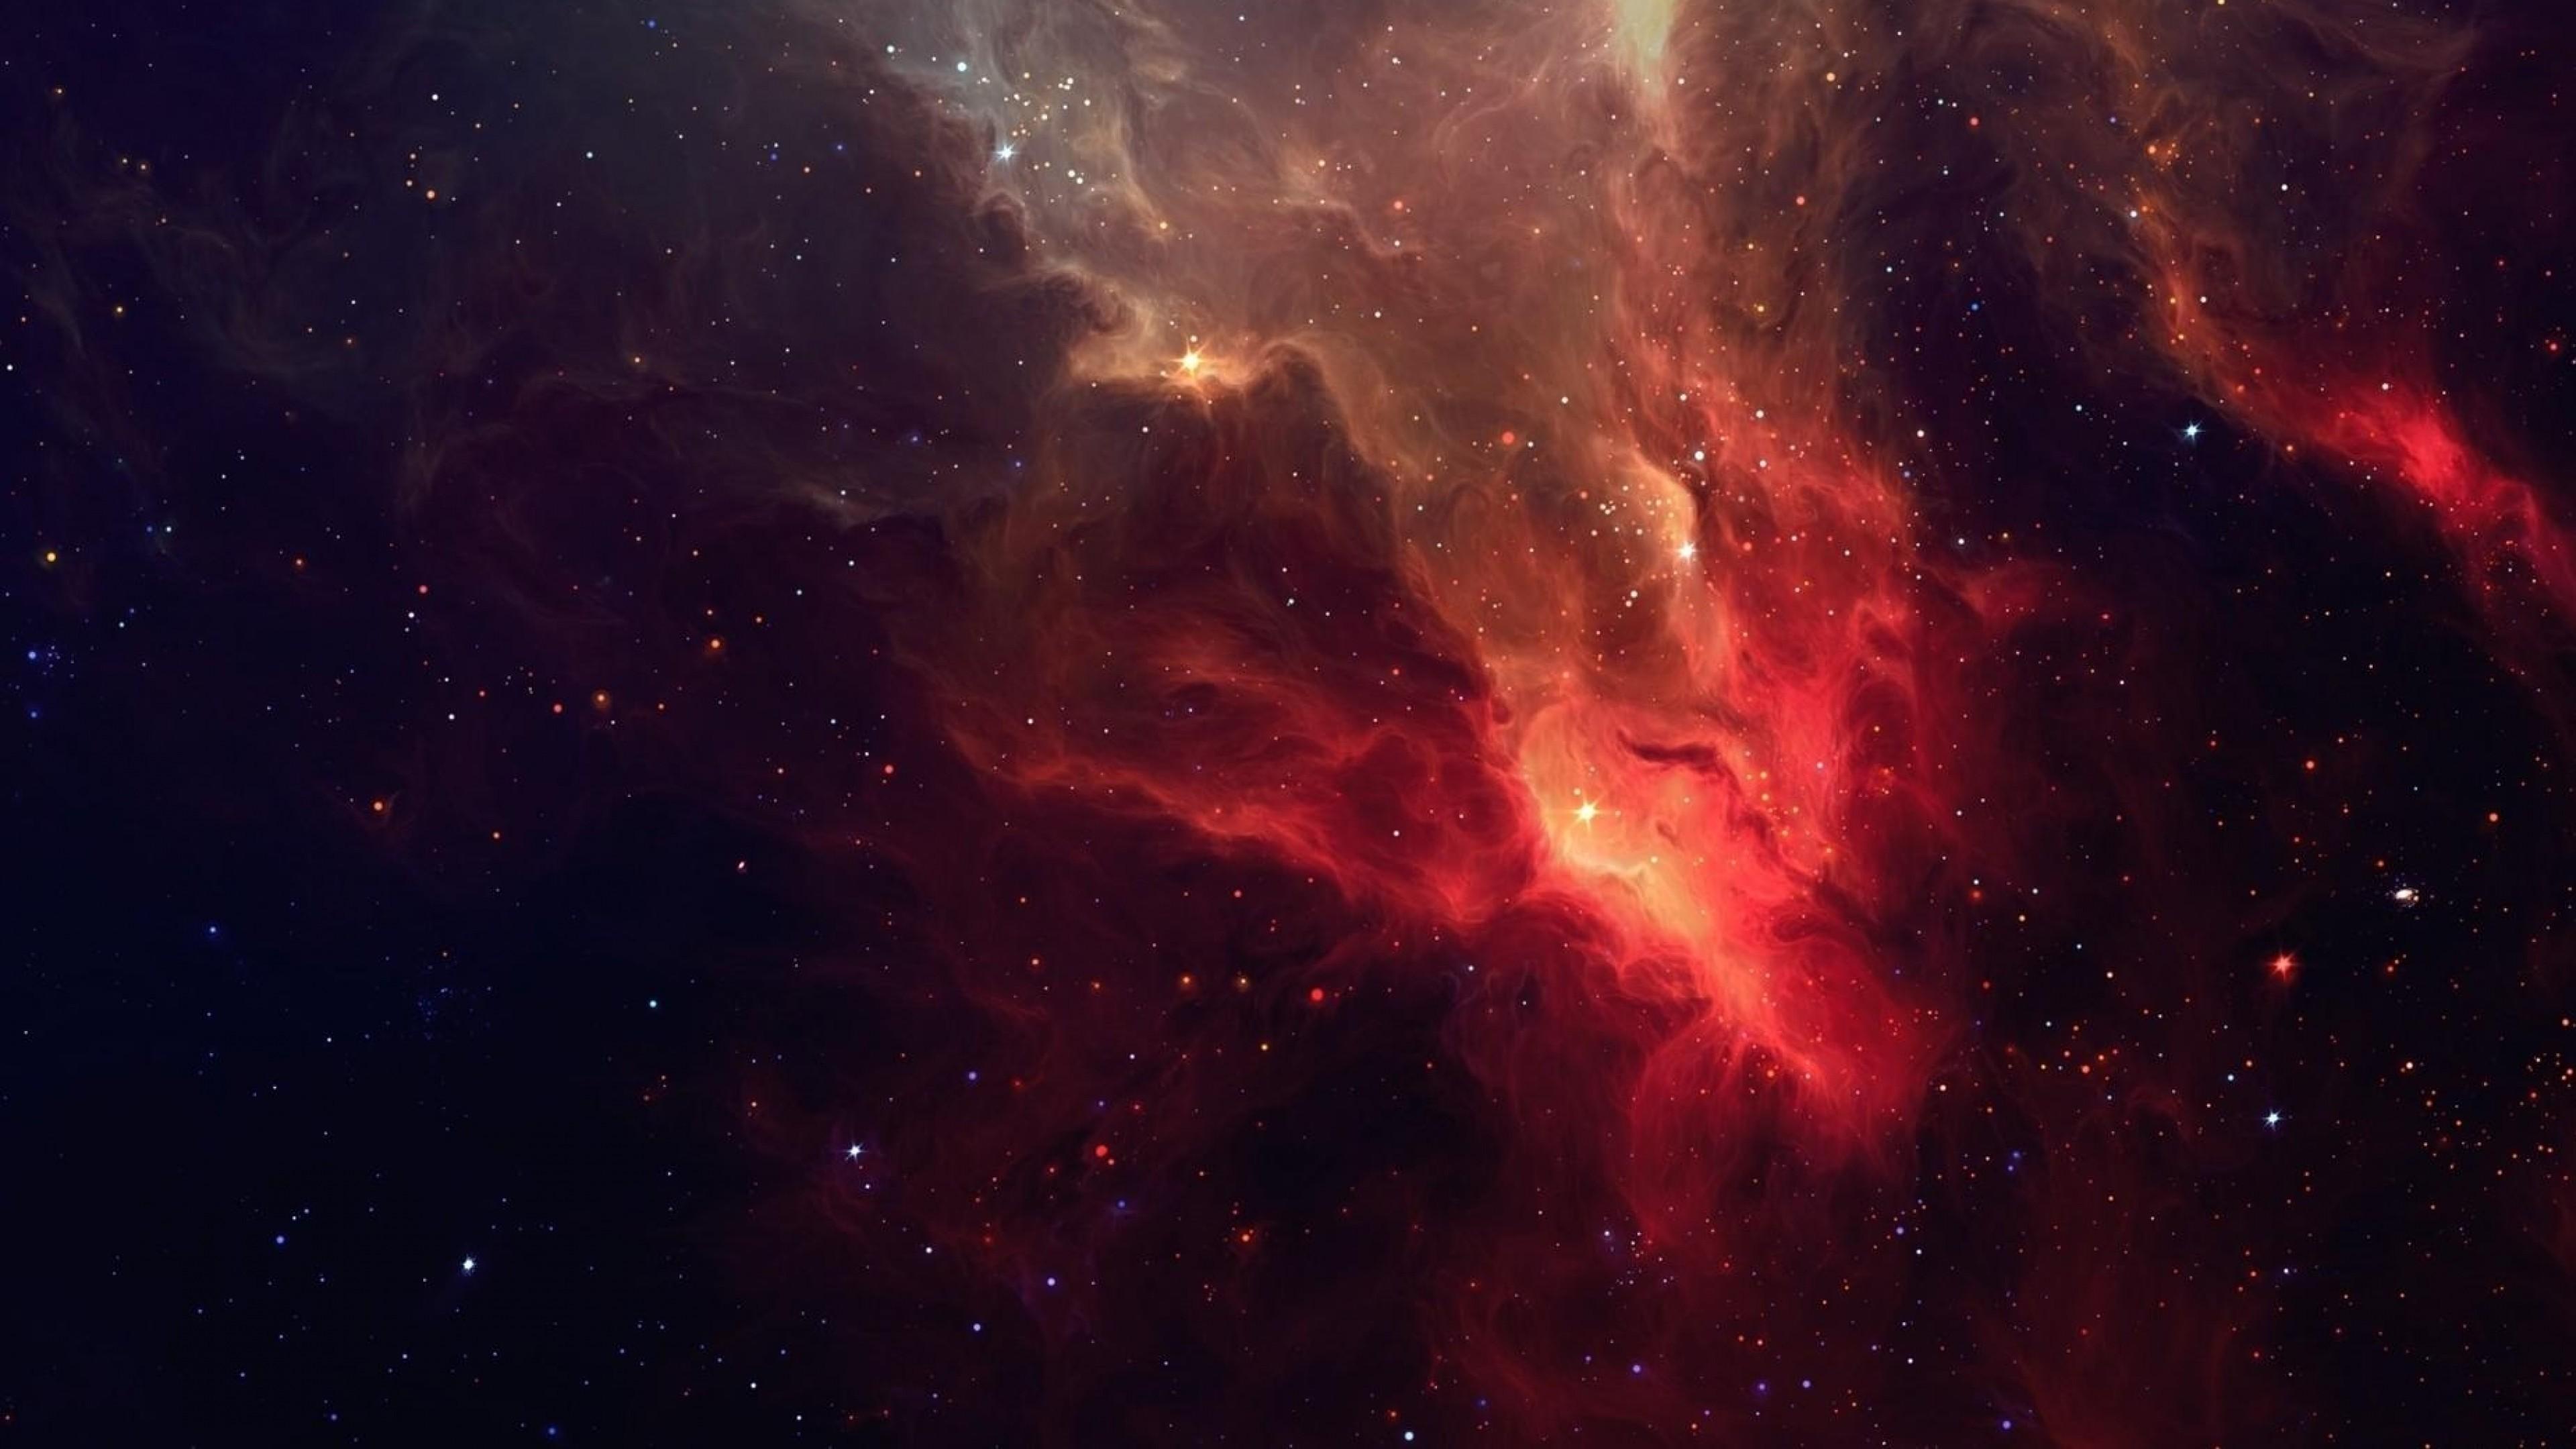 1304604 cool hd space galaxy wallpapers 3840x2160 ipad retina